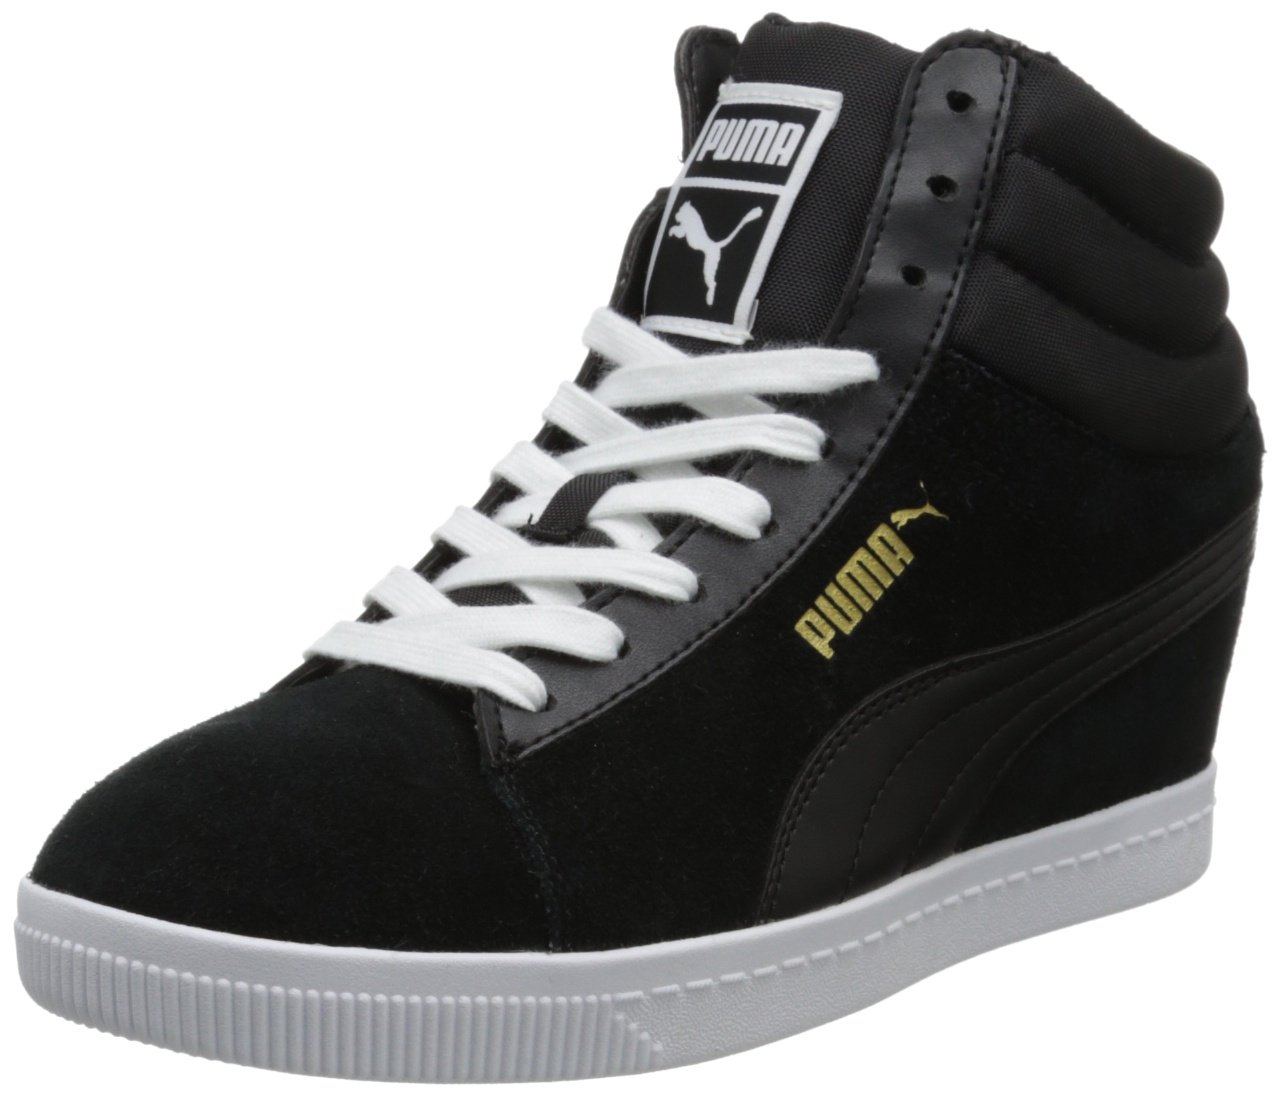 PUMA Women's Classic Wedge Sneaker- Buy